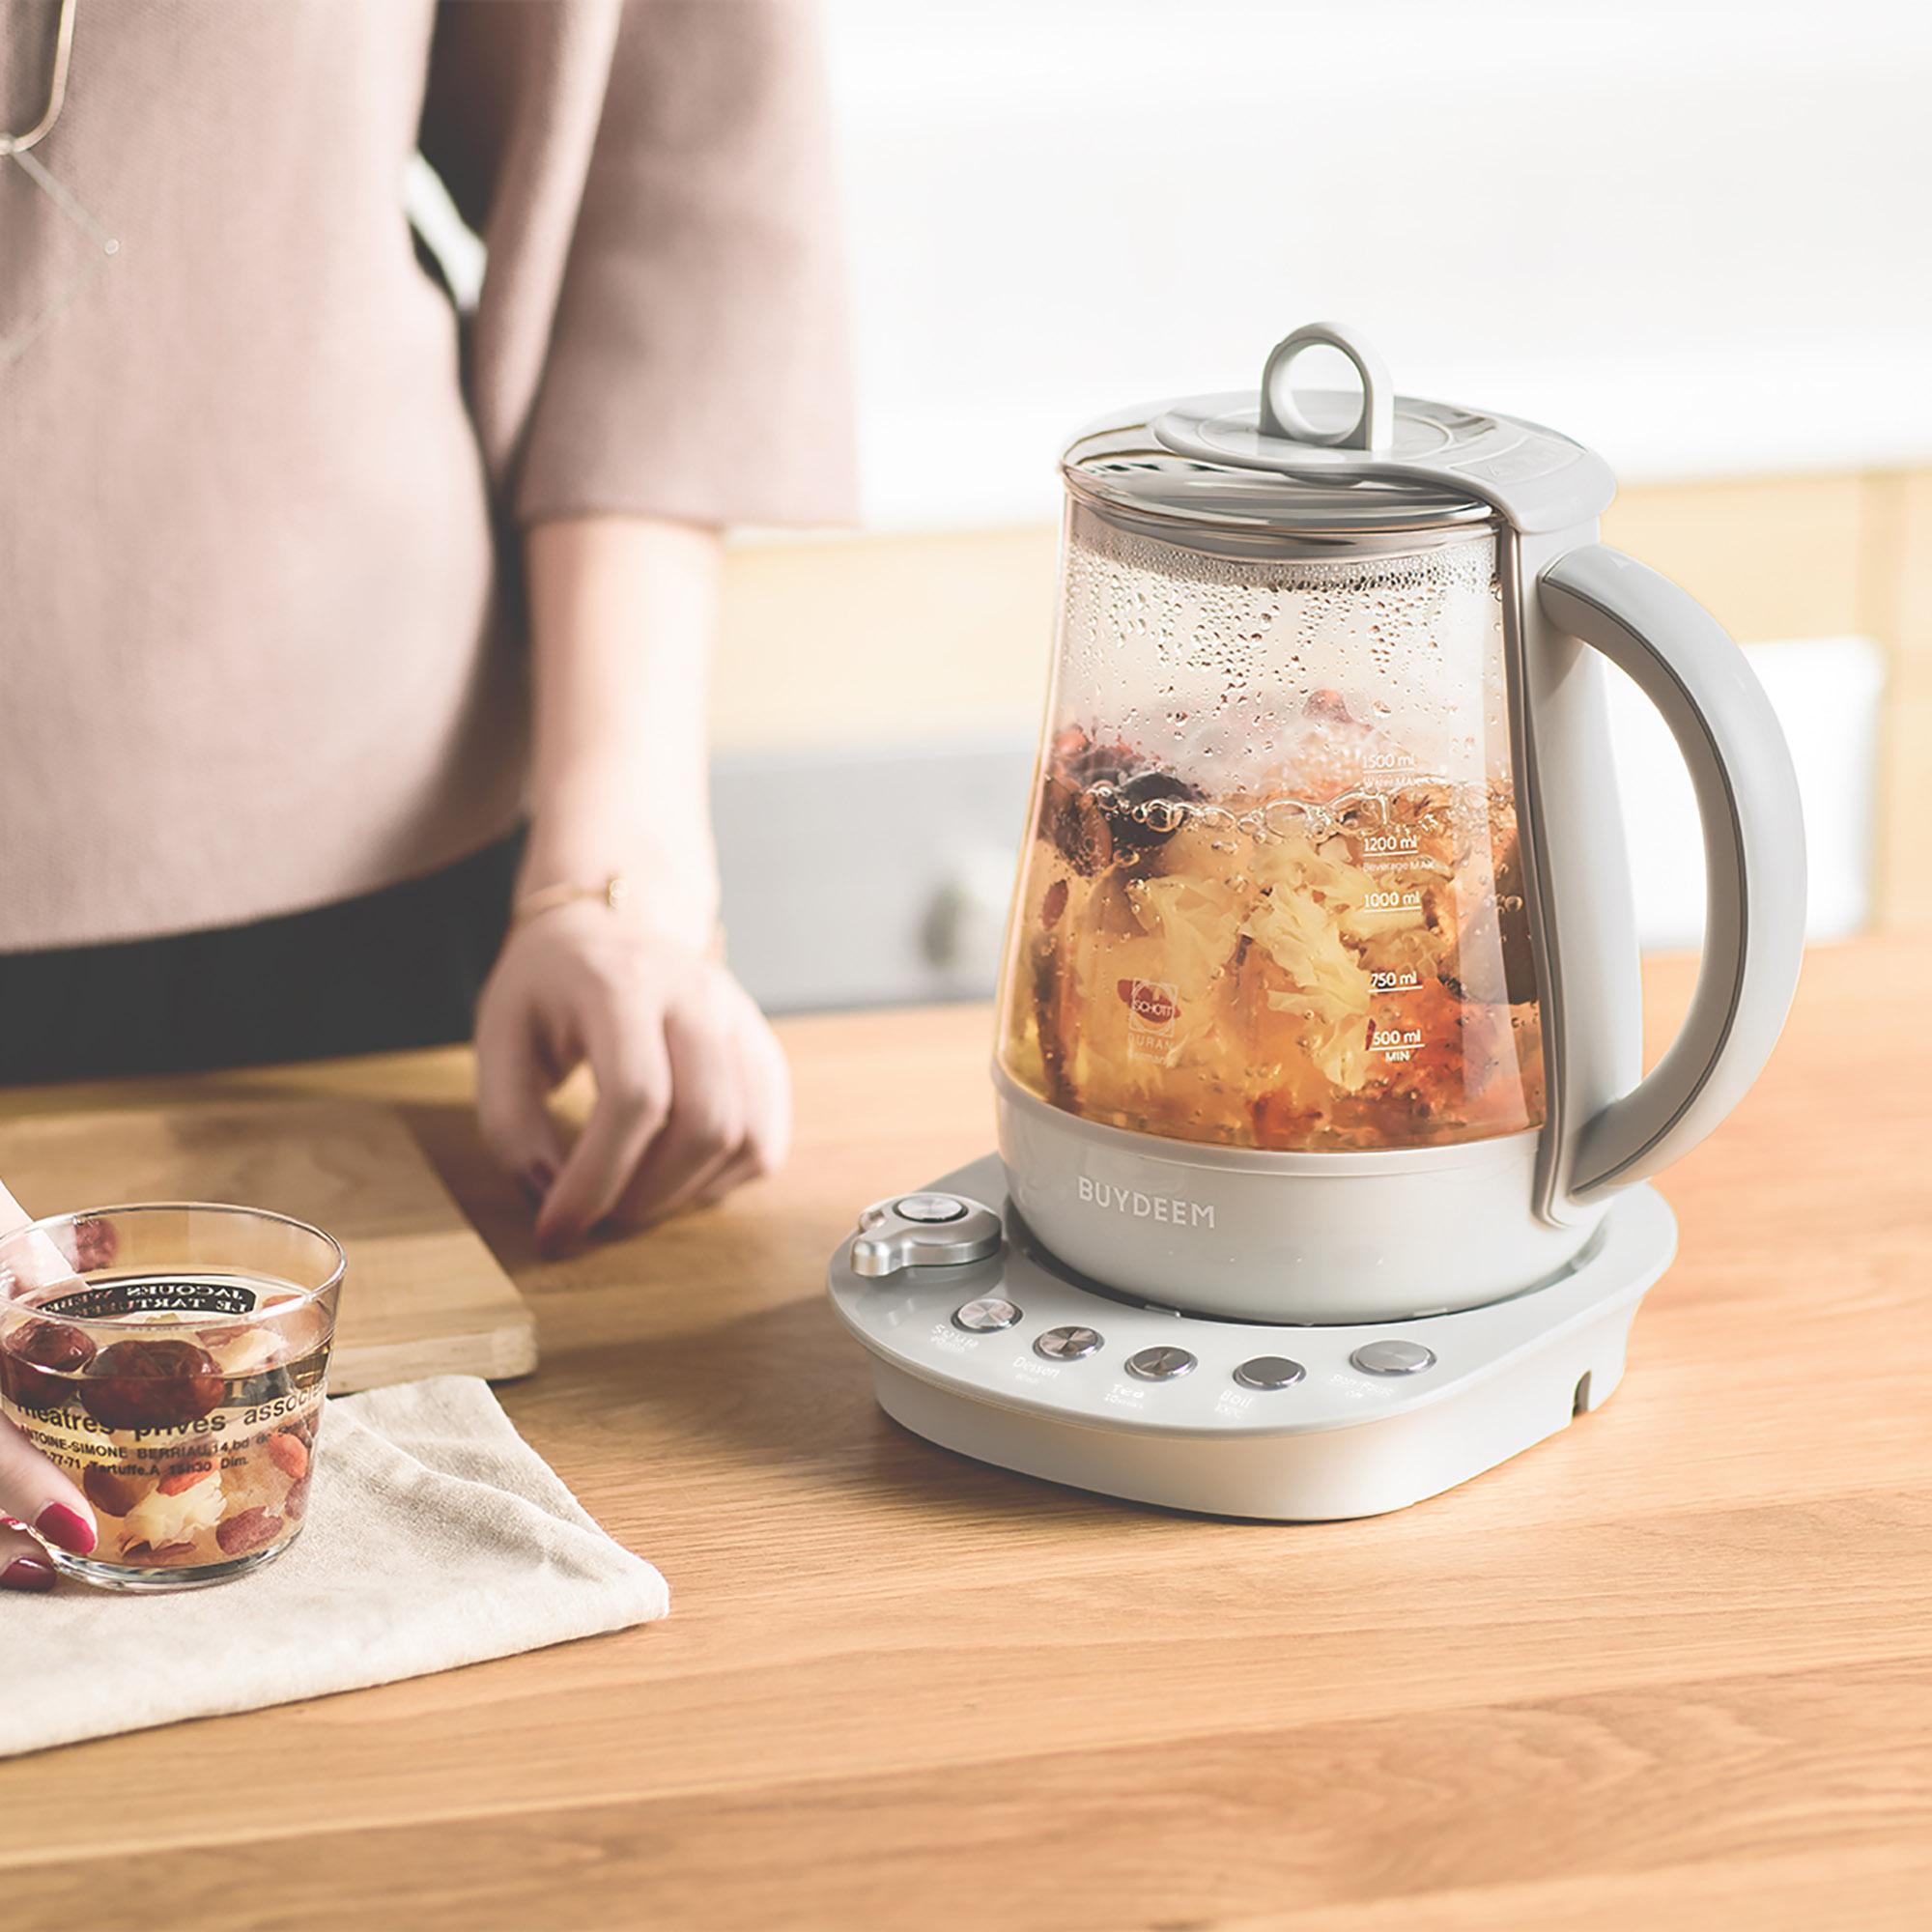 [US Direct] Original BUYDEEM K2683 Health-Care Beverage Tea Maker and Kettle, 9-in-1 Programmable Brew Cooker Master (1.5 L, Gray) Grey